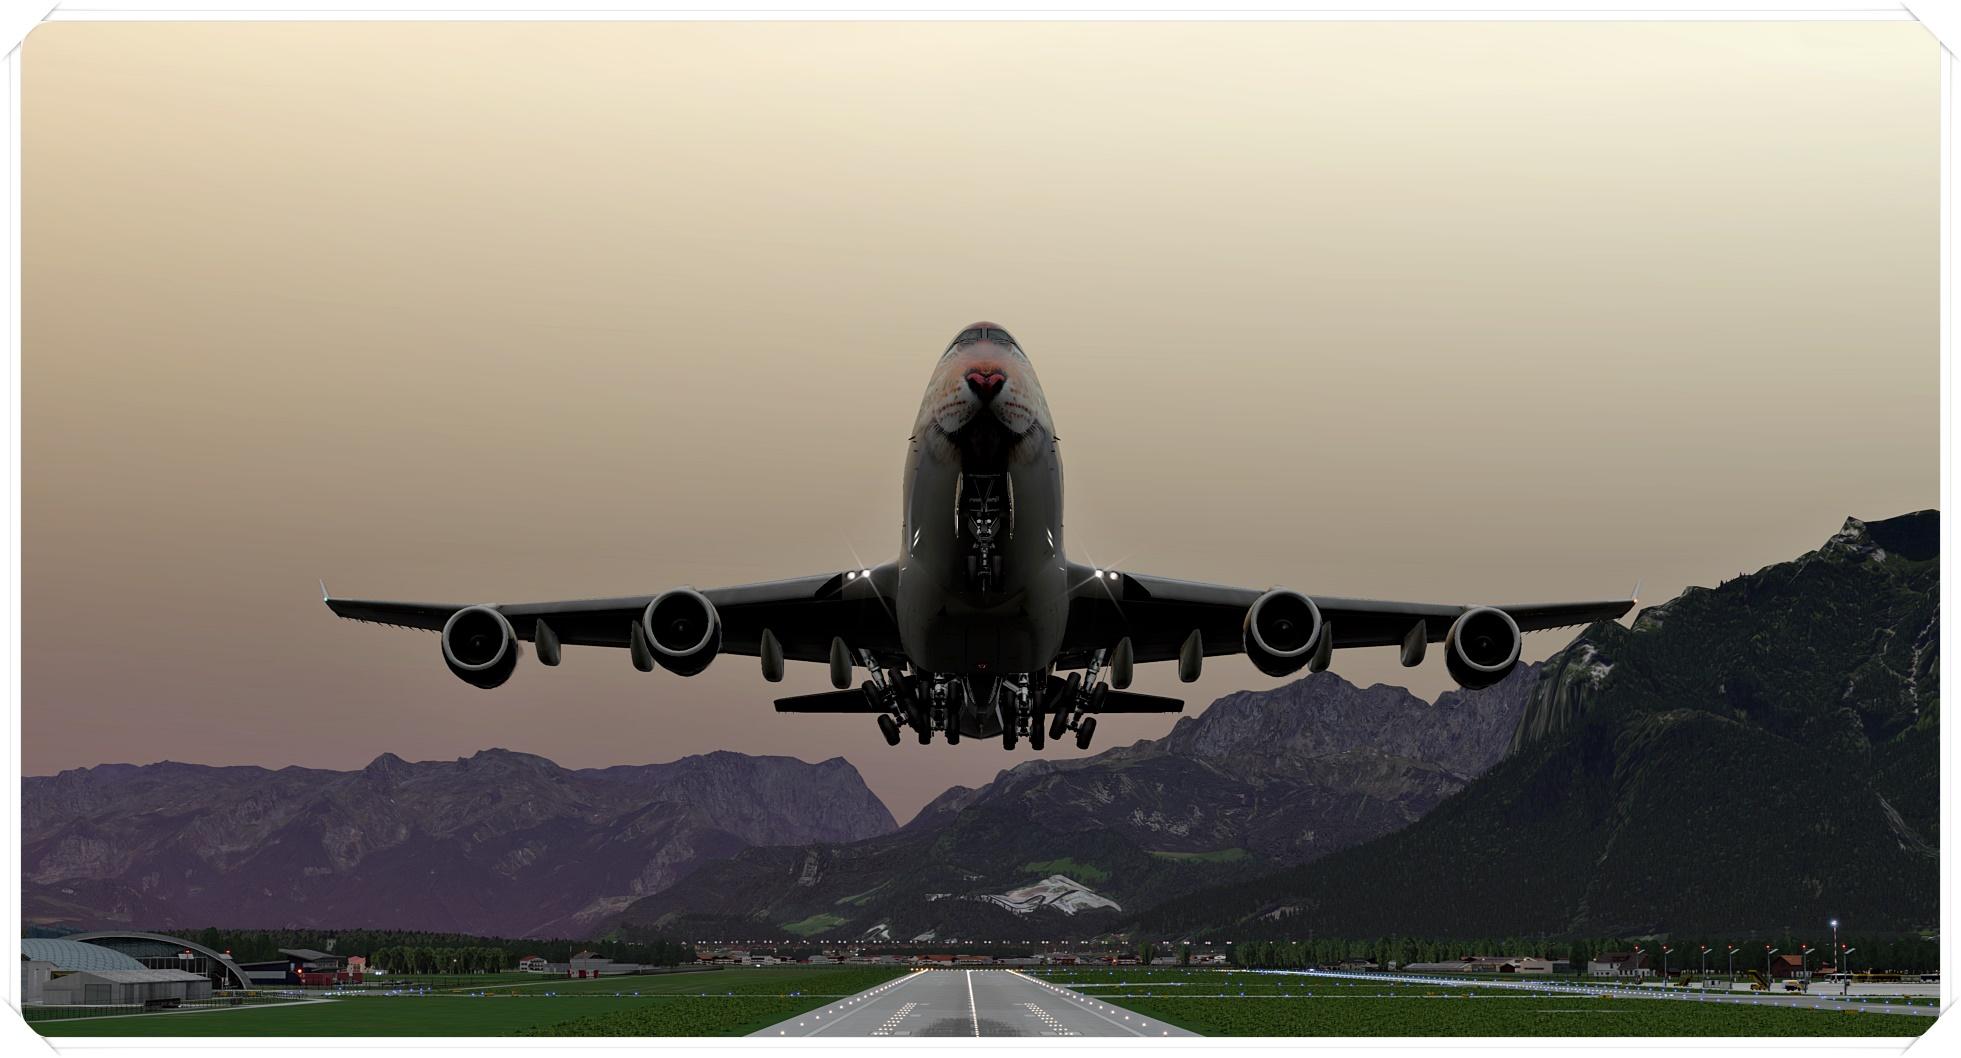 747-400_7p4o4u.jpg